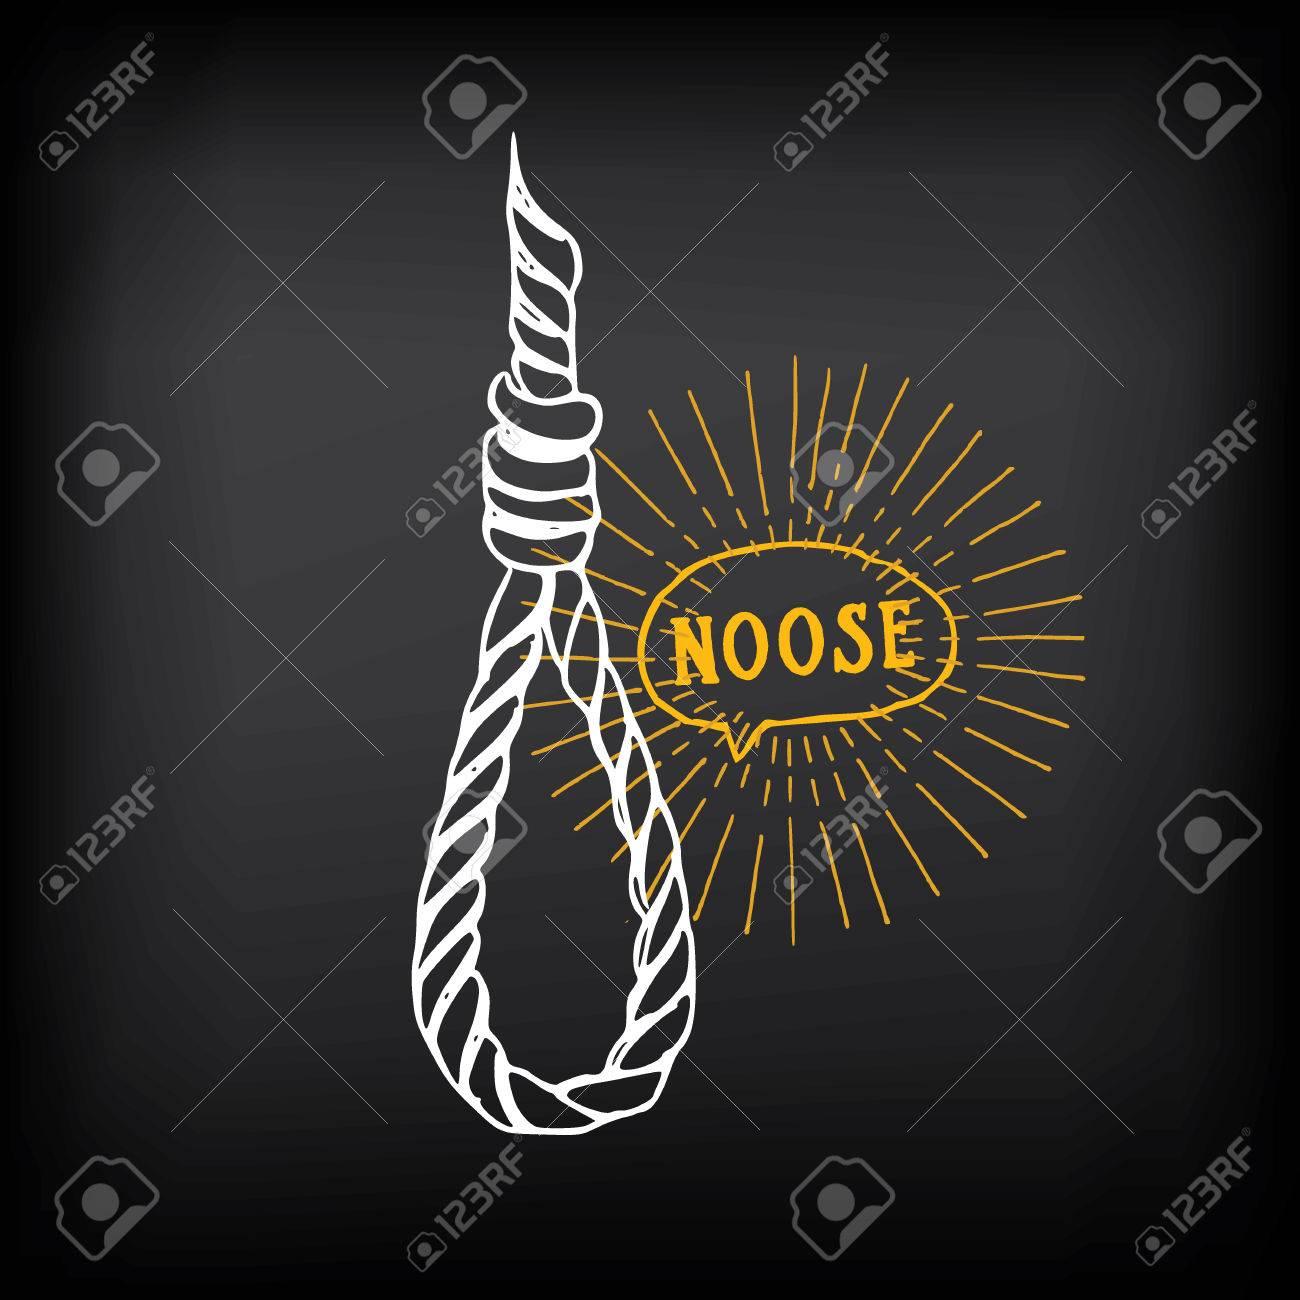 Hanging Rope Noose Sketch Design Royalty Free Cliparts Vectors